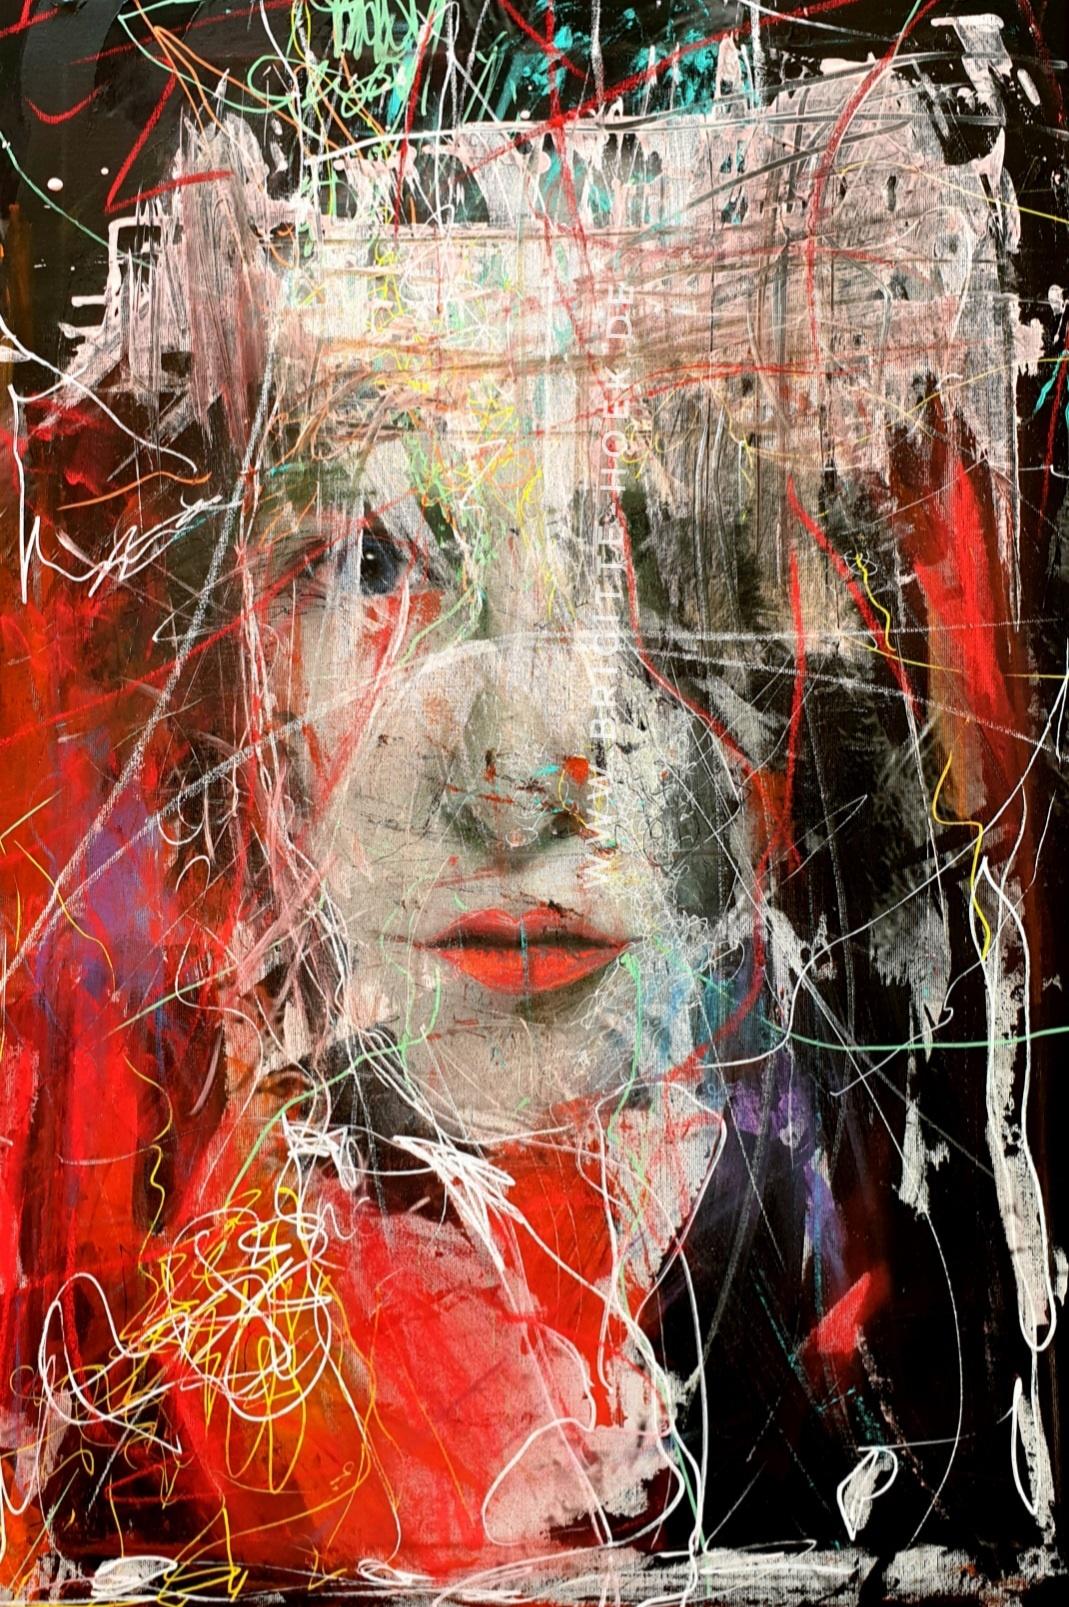 Modern Art by Brigitte Hök